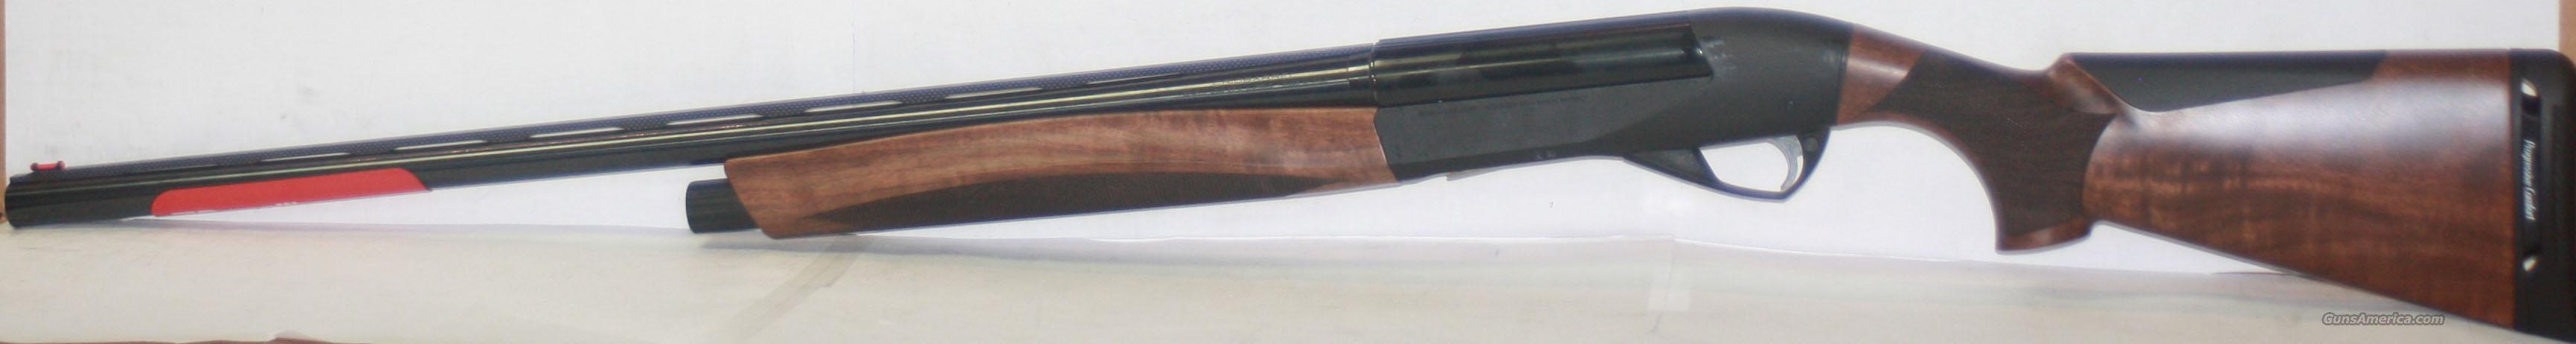 "BENELLI ETHOS 12 GA 28"" AA WALNUT BLUE PROGRESSIVE COMFORT NEW IN HARD CASE  Guns > Shotguns > Benelli Shotguns > Sporting"